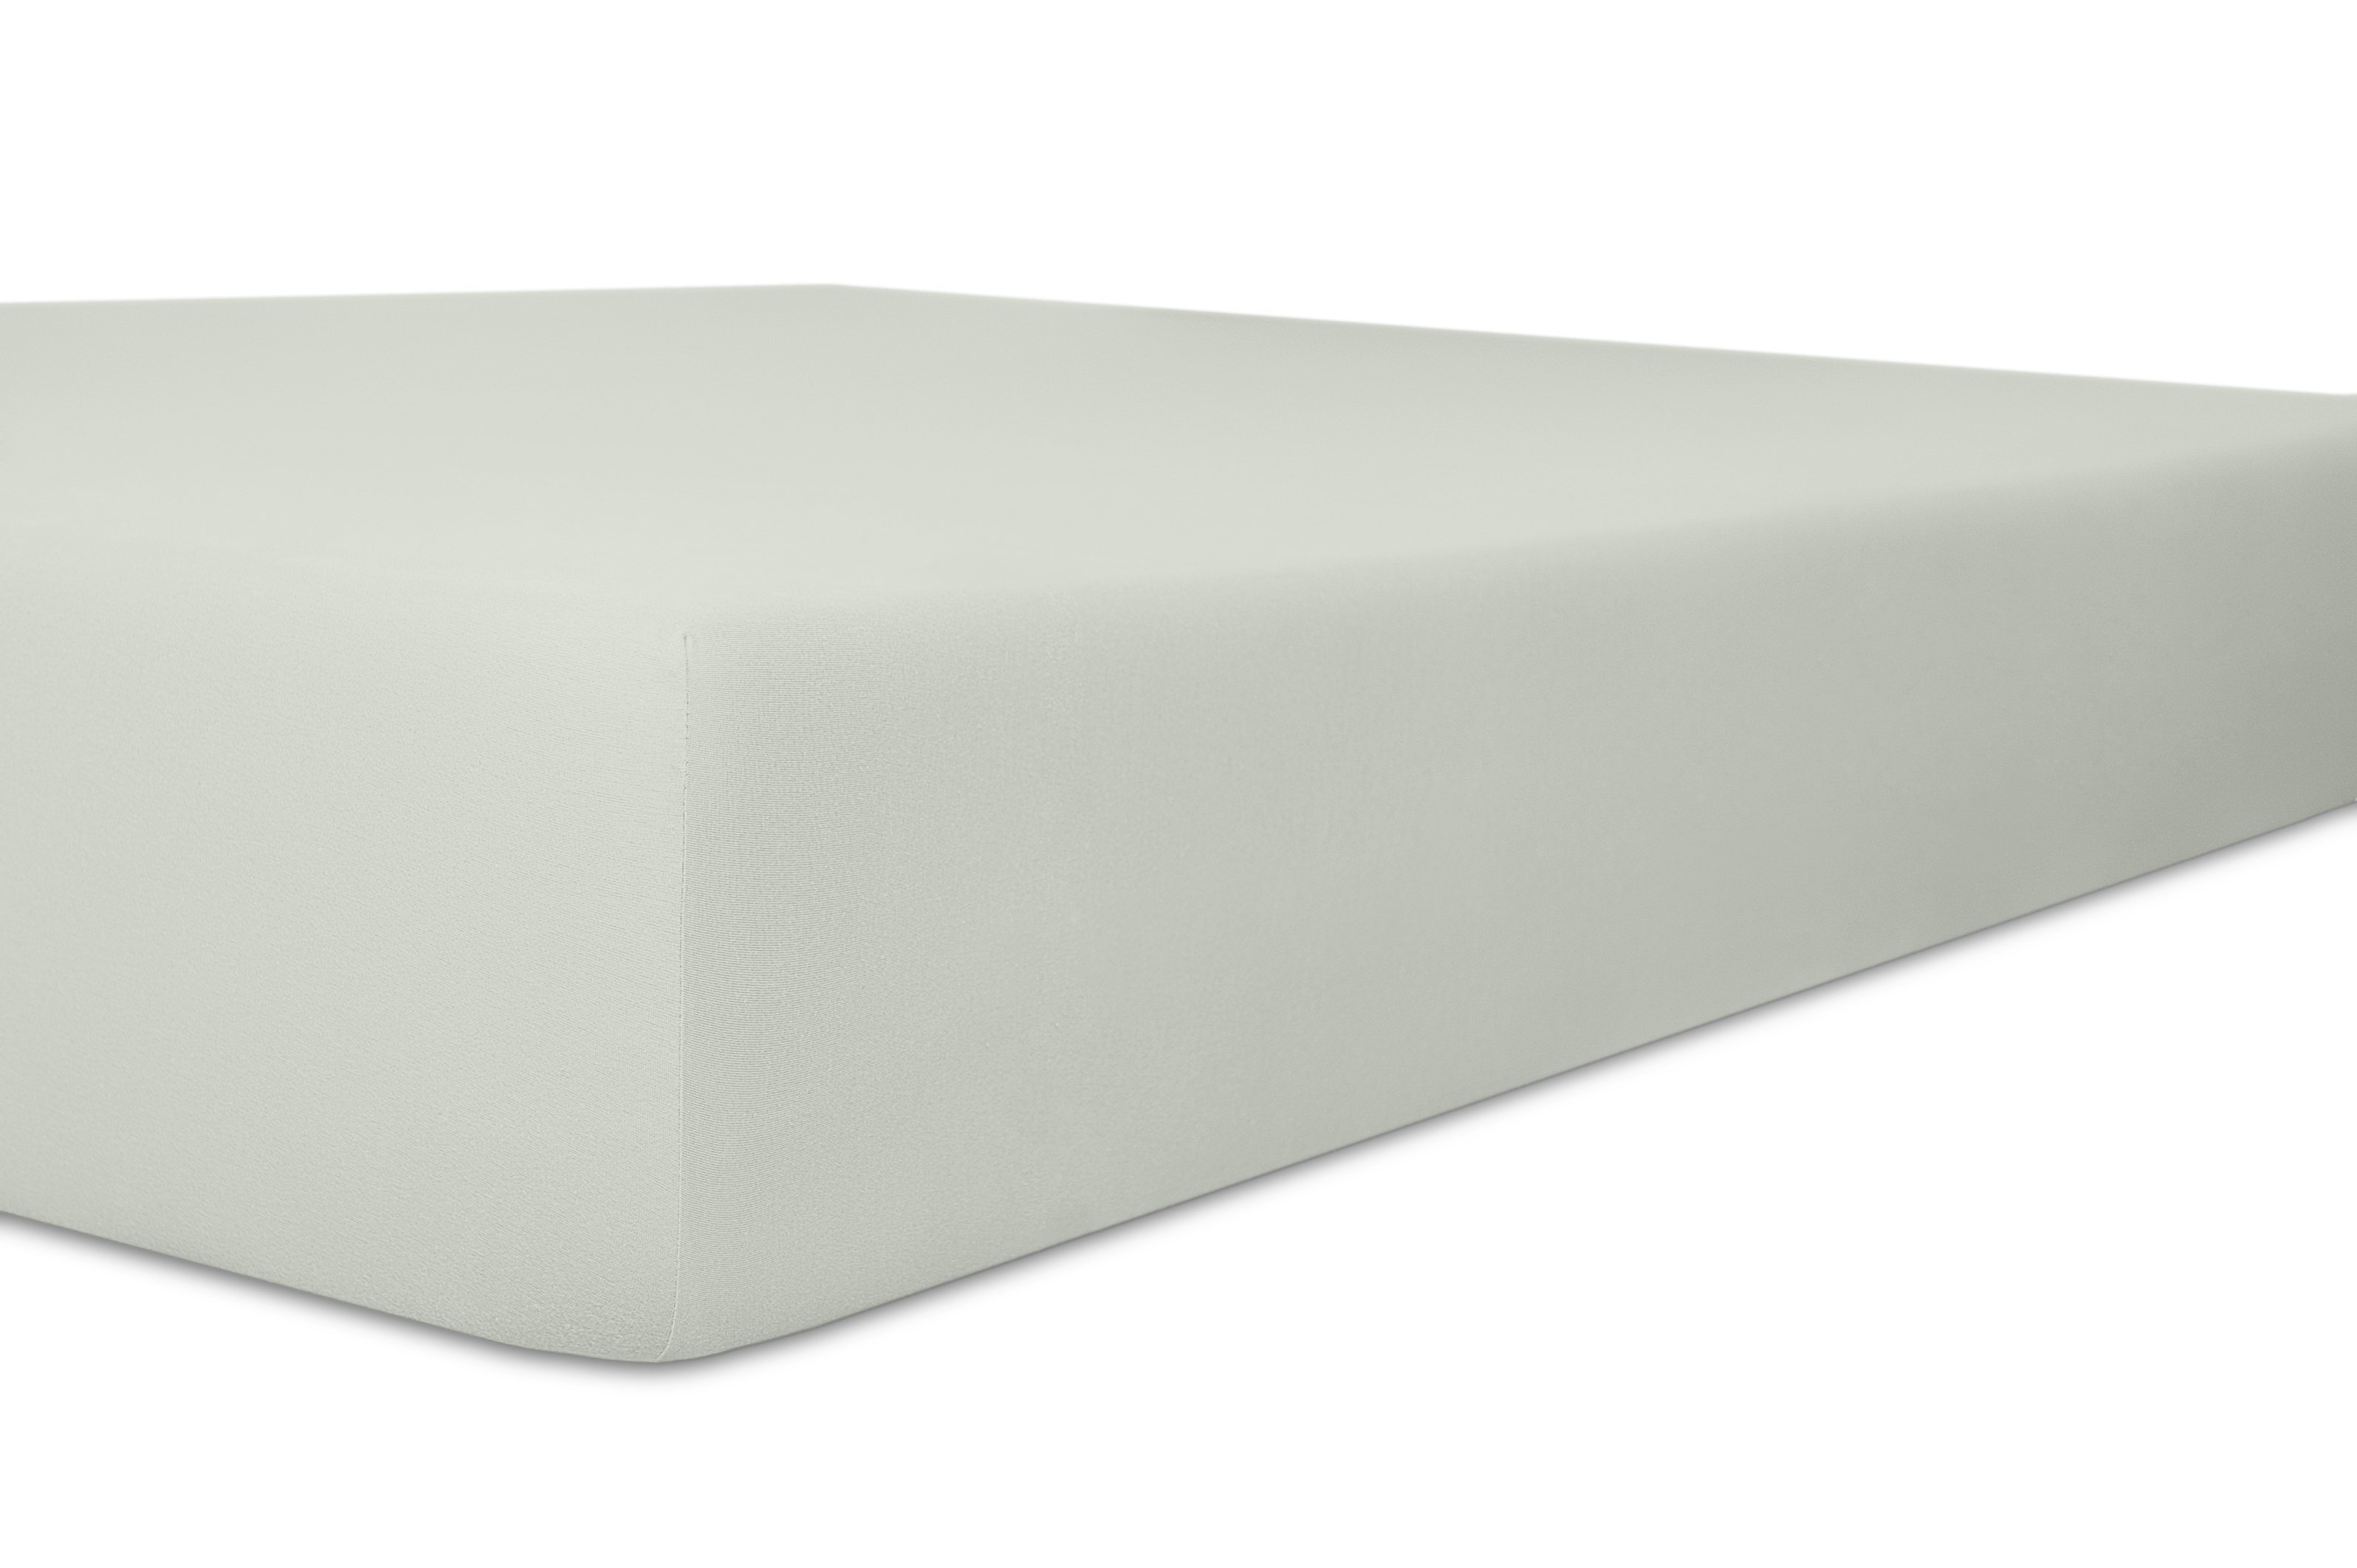 Spannbetttuch Standard platin 50% Baumwolle / 45% Modal / 5% Elasthan